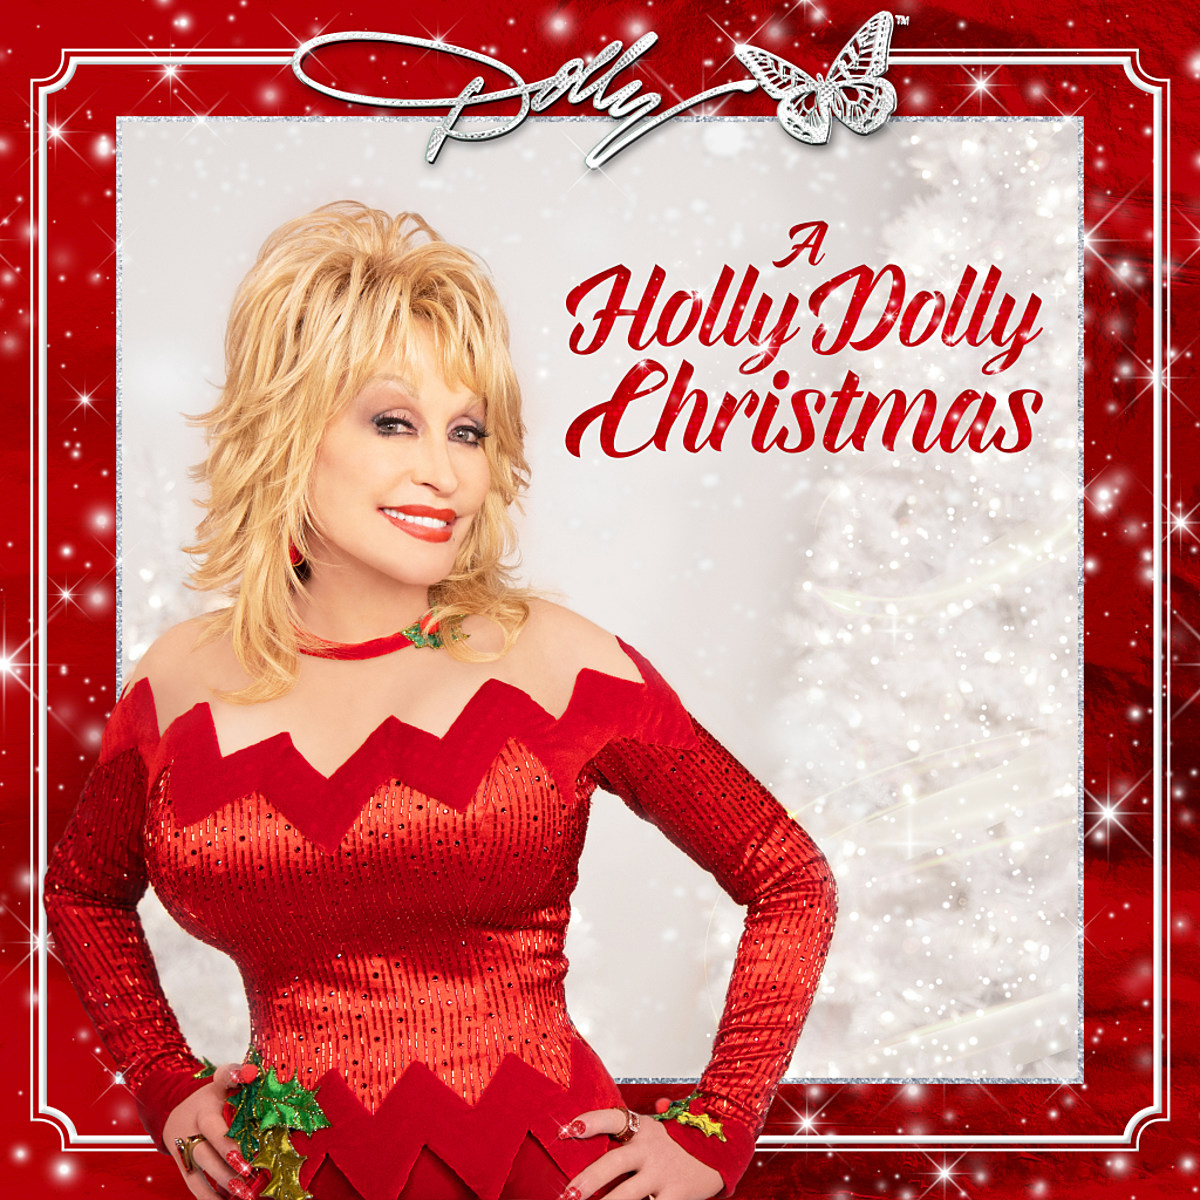 New Christmas Albums 2020 Dolly Parton announces new Christmas album ft. Willie Nelson